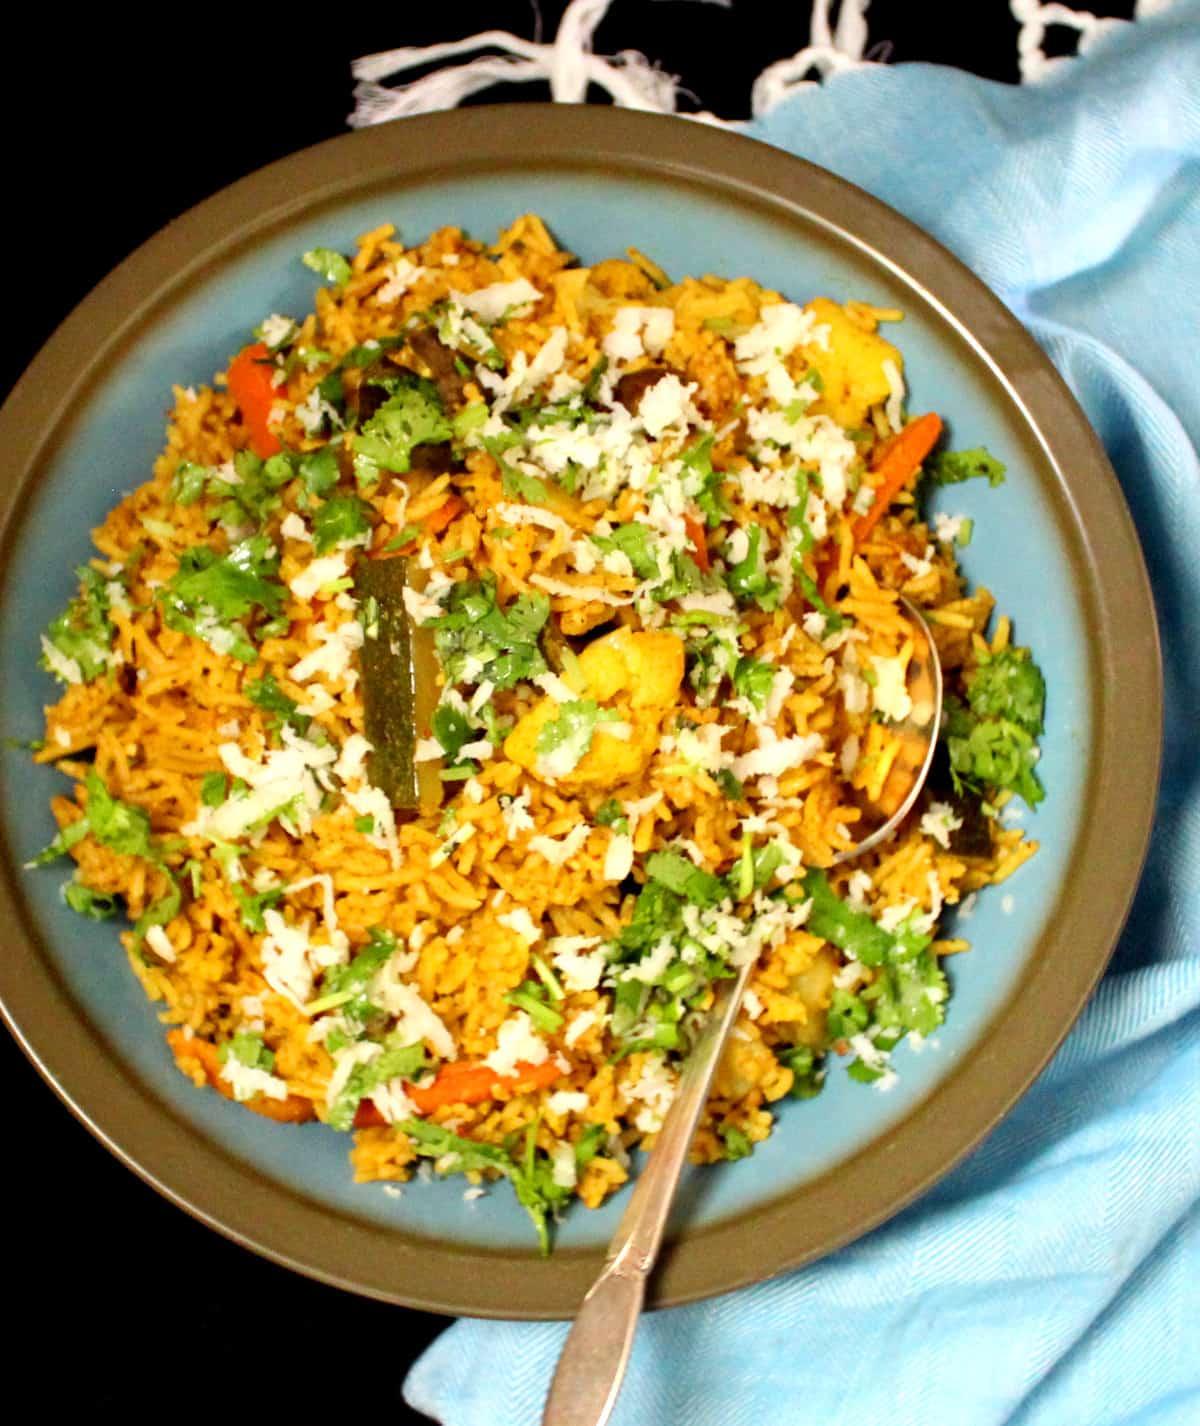 Masale Bhath, arroz veg misto do oeste da Índia